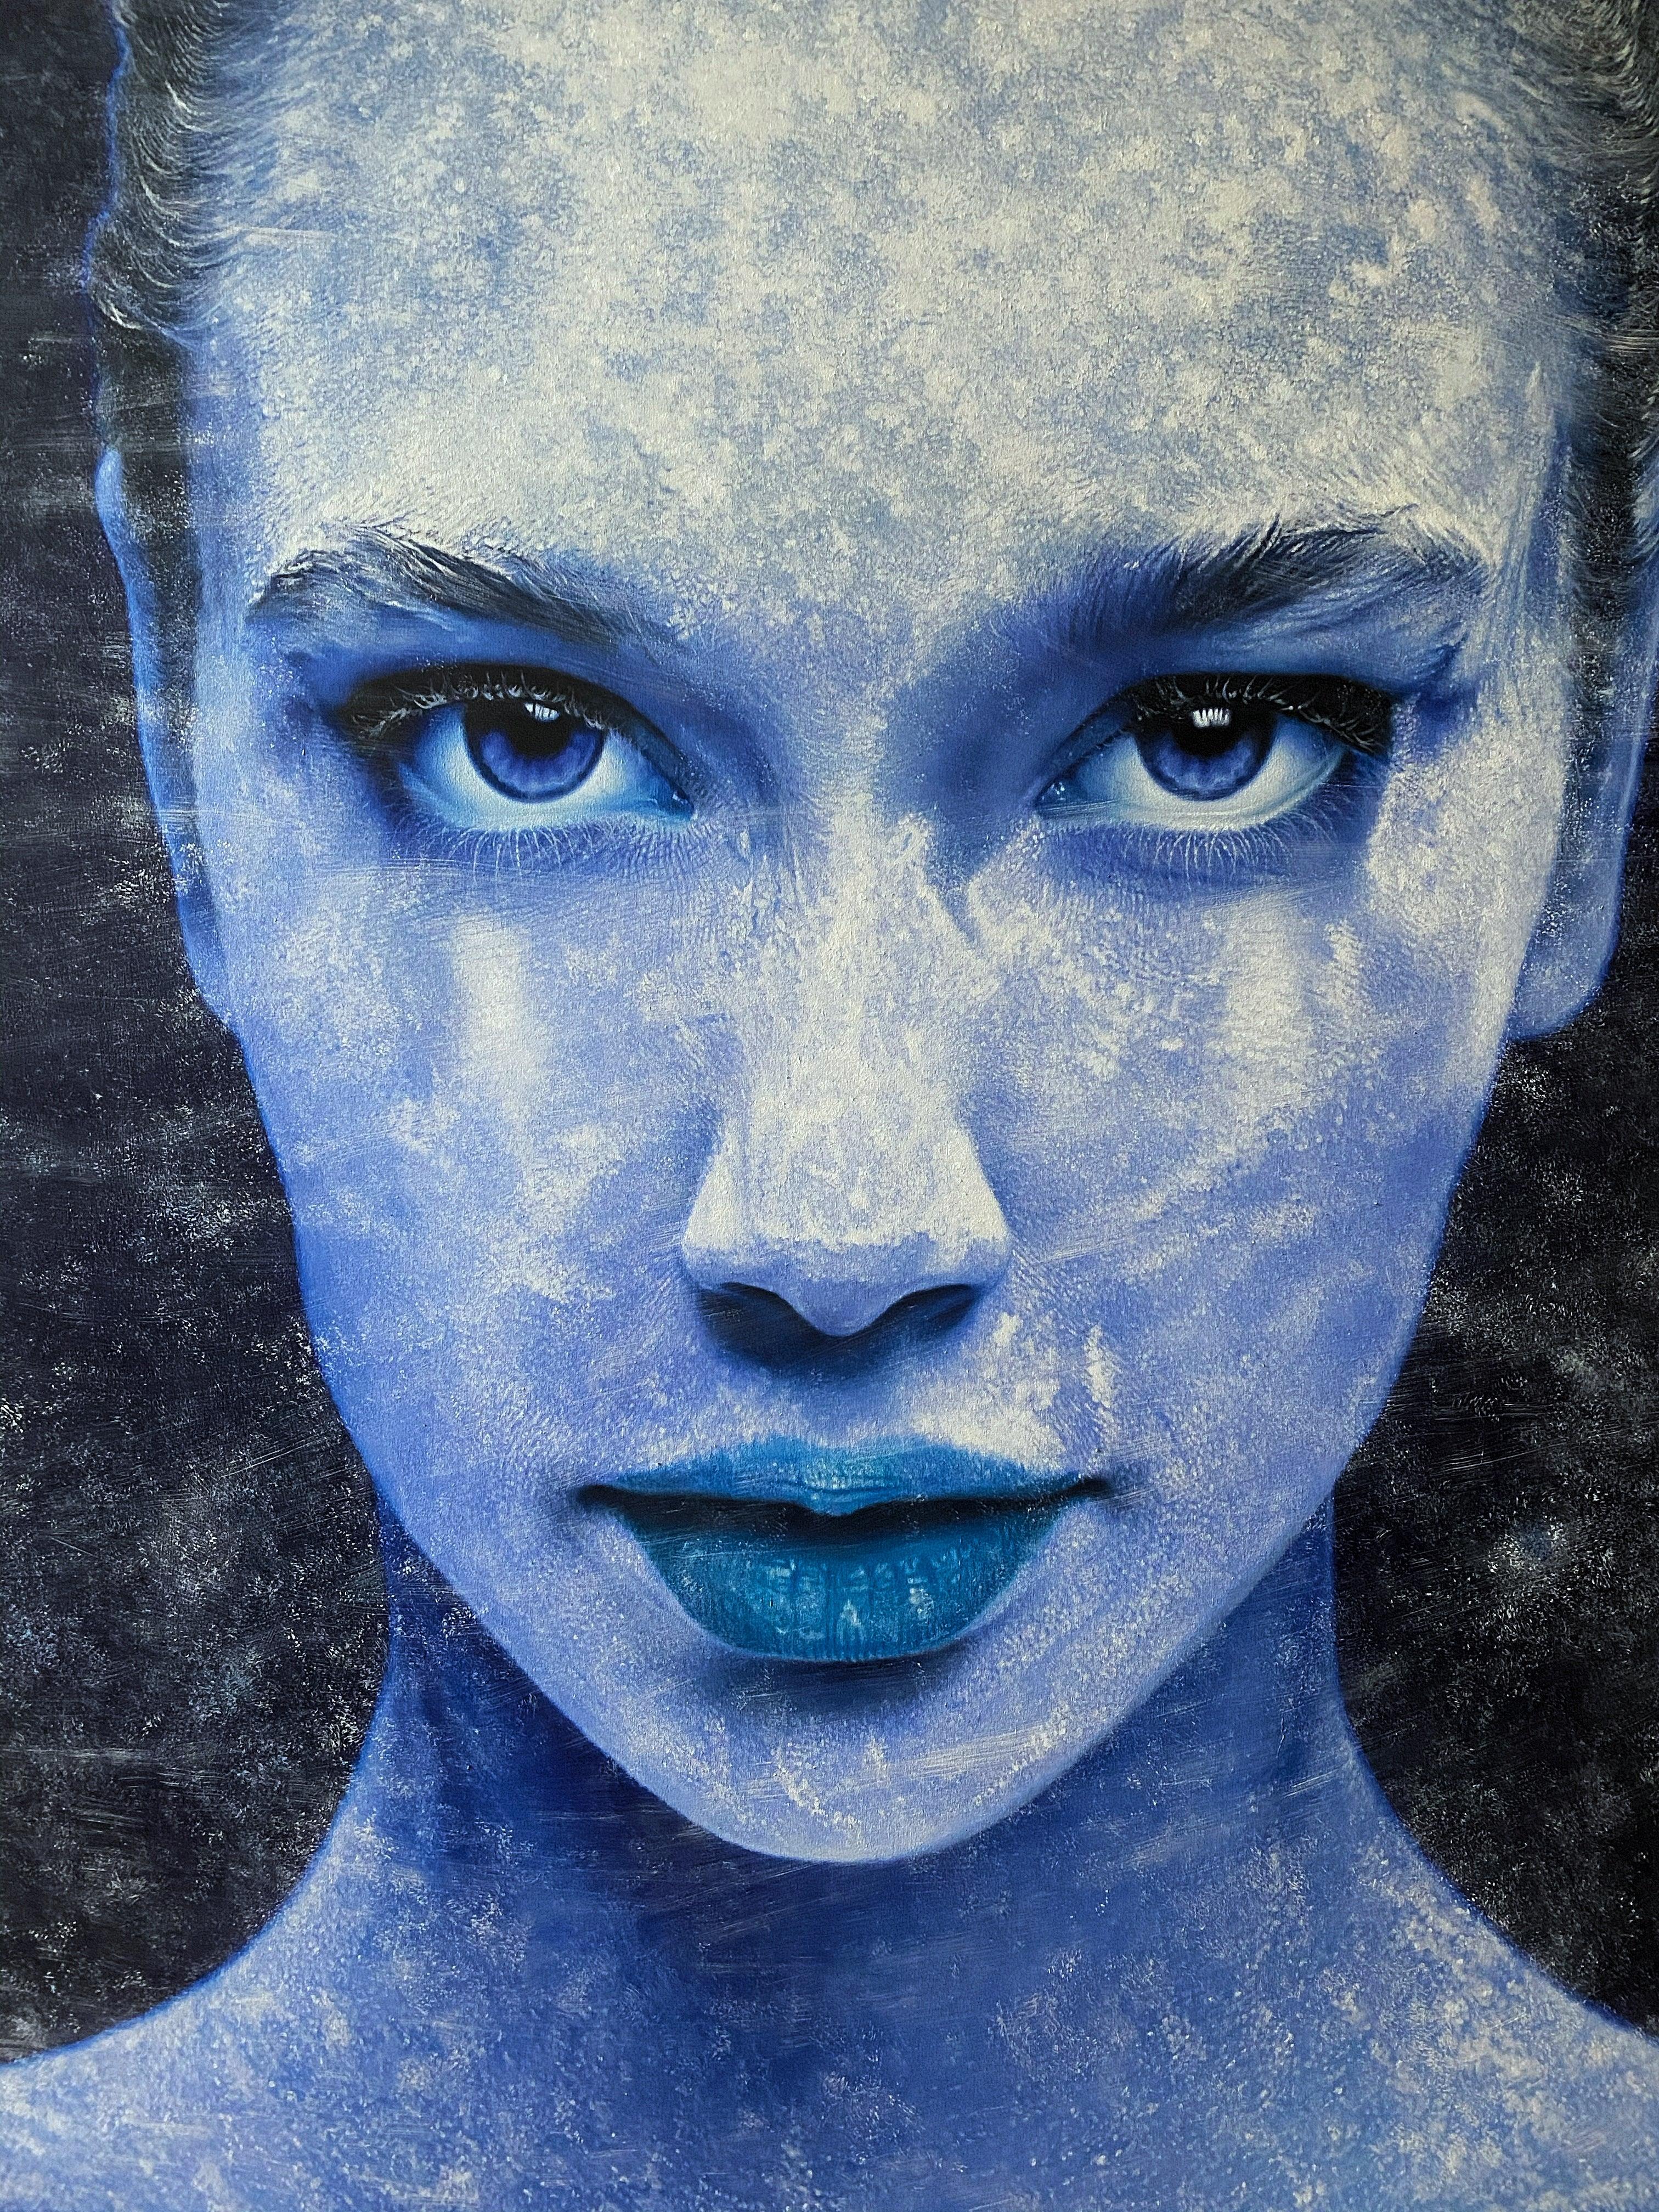 """Astral"" Oil on canvas painting 47"" x 39"" inch by Dmitriy Krestniy"